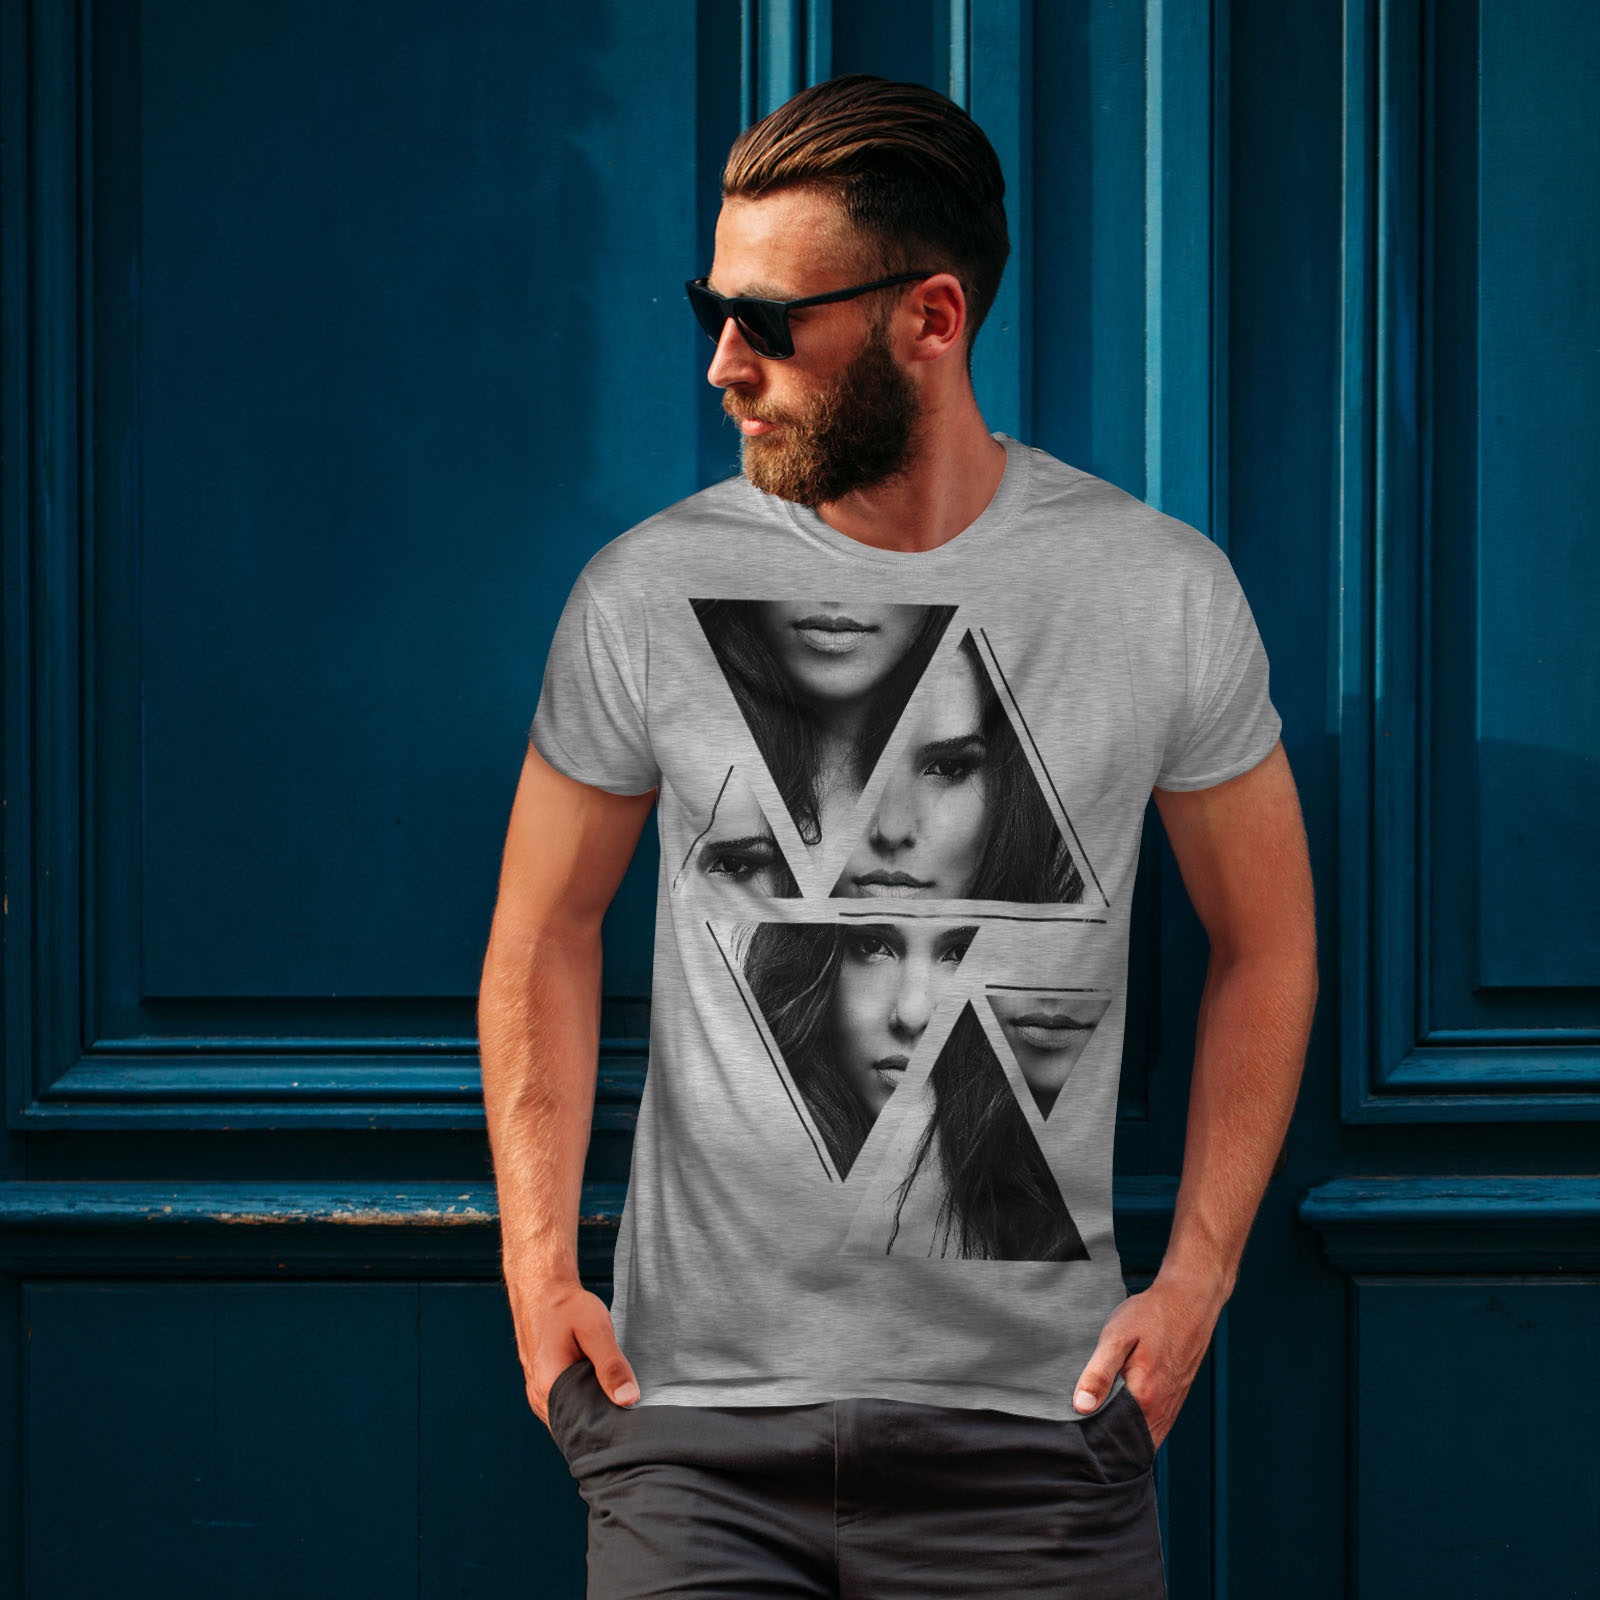 Wellcoda-Art-Fashion-Face-T-shirt-homme-Abstract-Design-graphique-imprime-Tee miniature 16